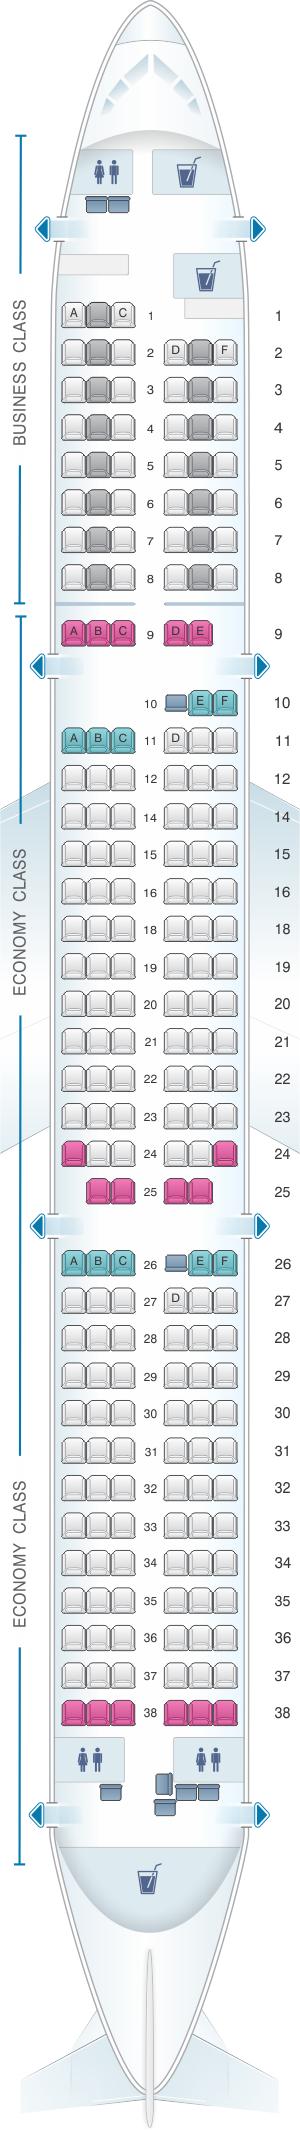 Seat Map Lufthansa Airbus A321